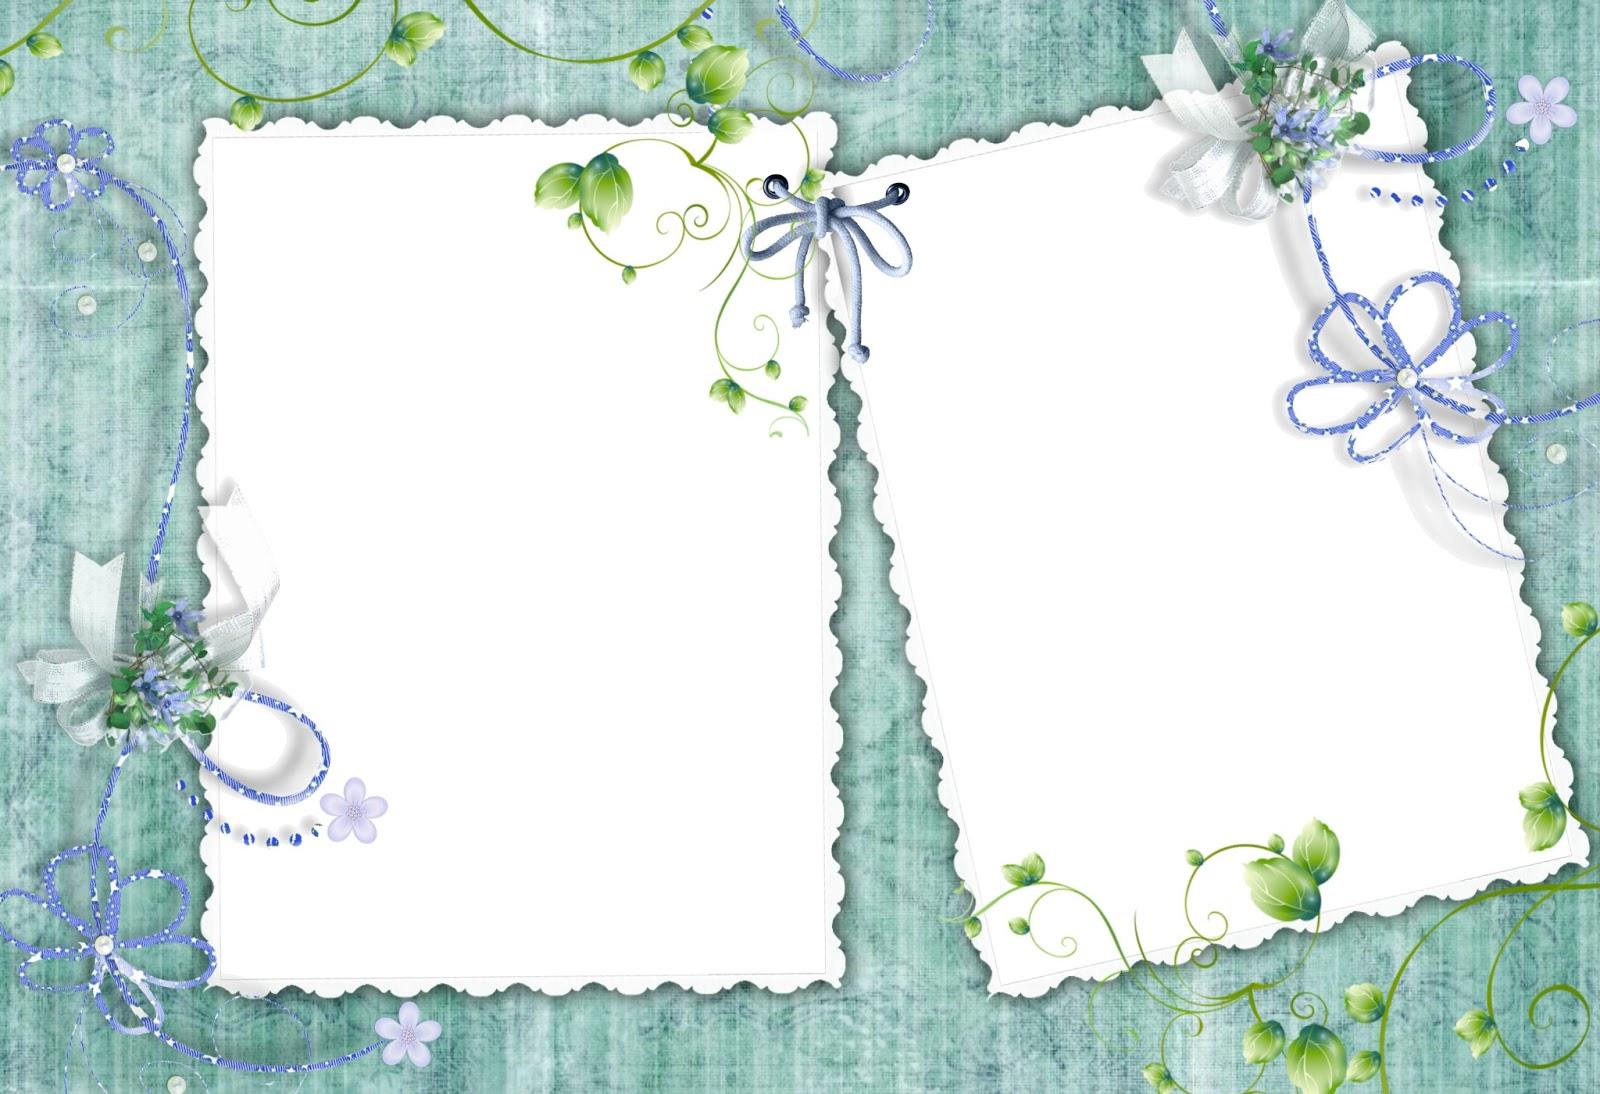 png рамки для фотографий: Рамки для изготовления красивых ...: http://png-frames.blogspot.com/2013/02/png_6656.html